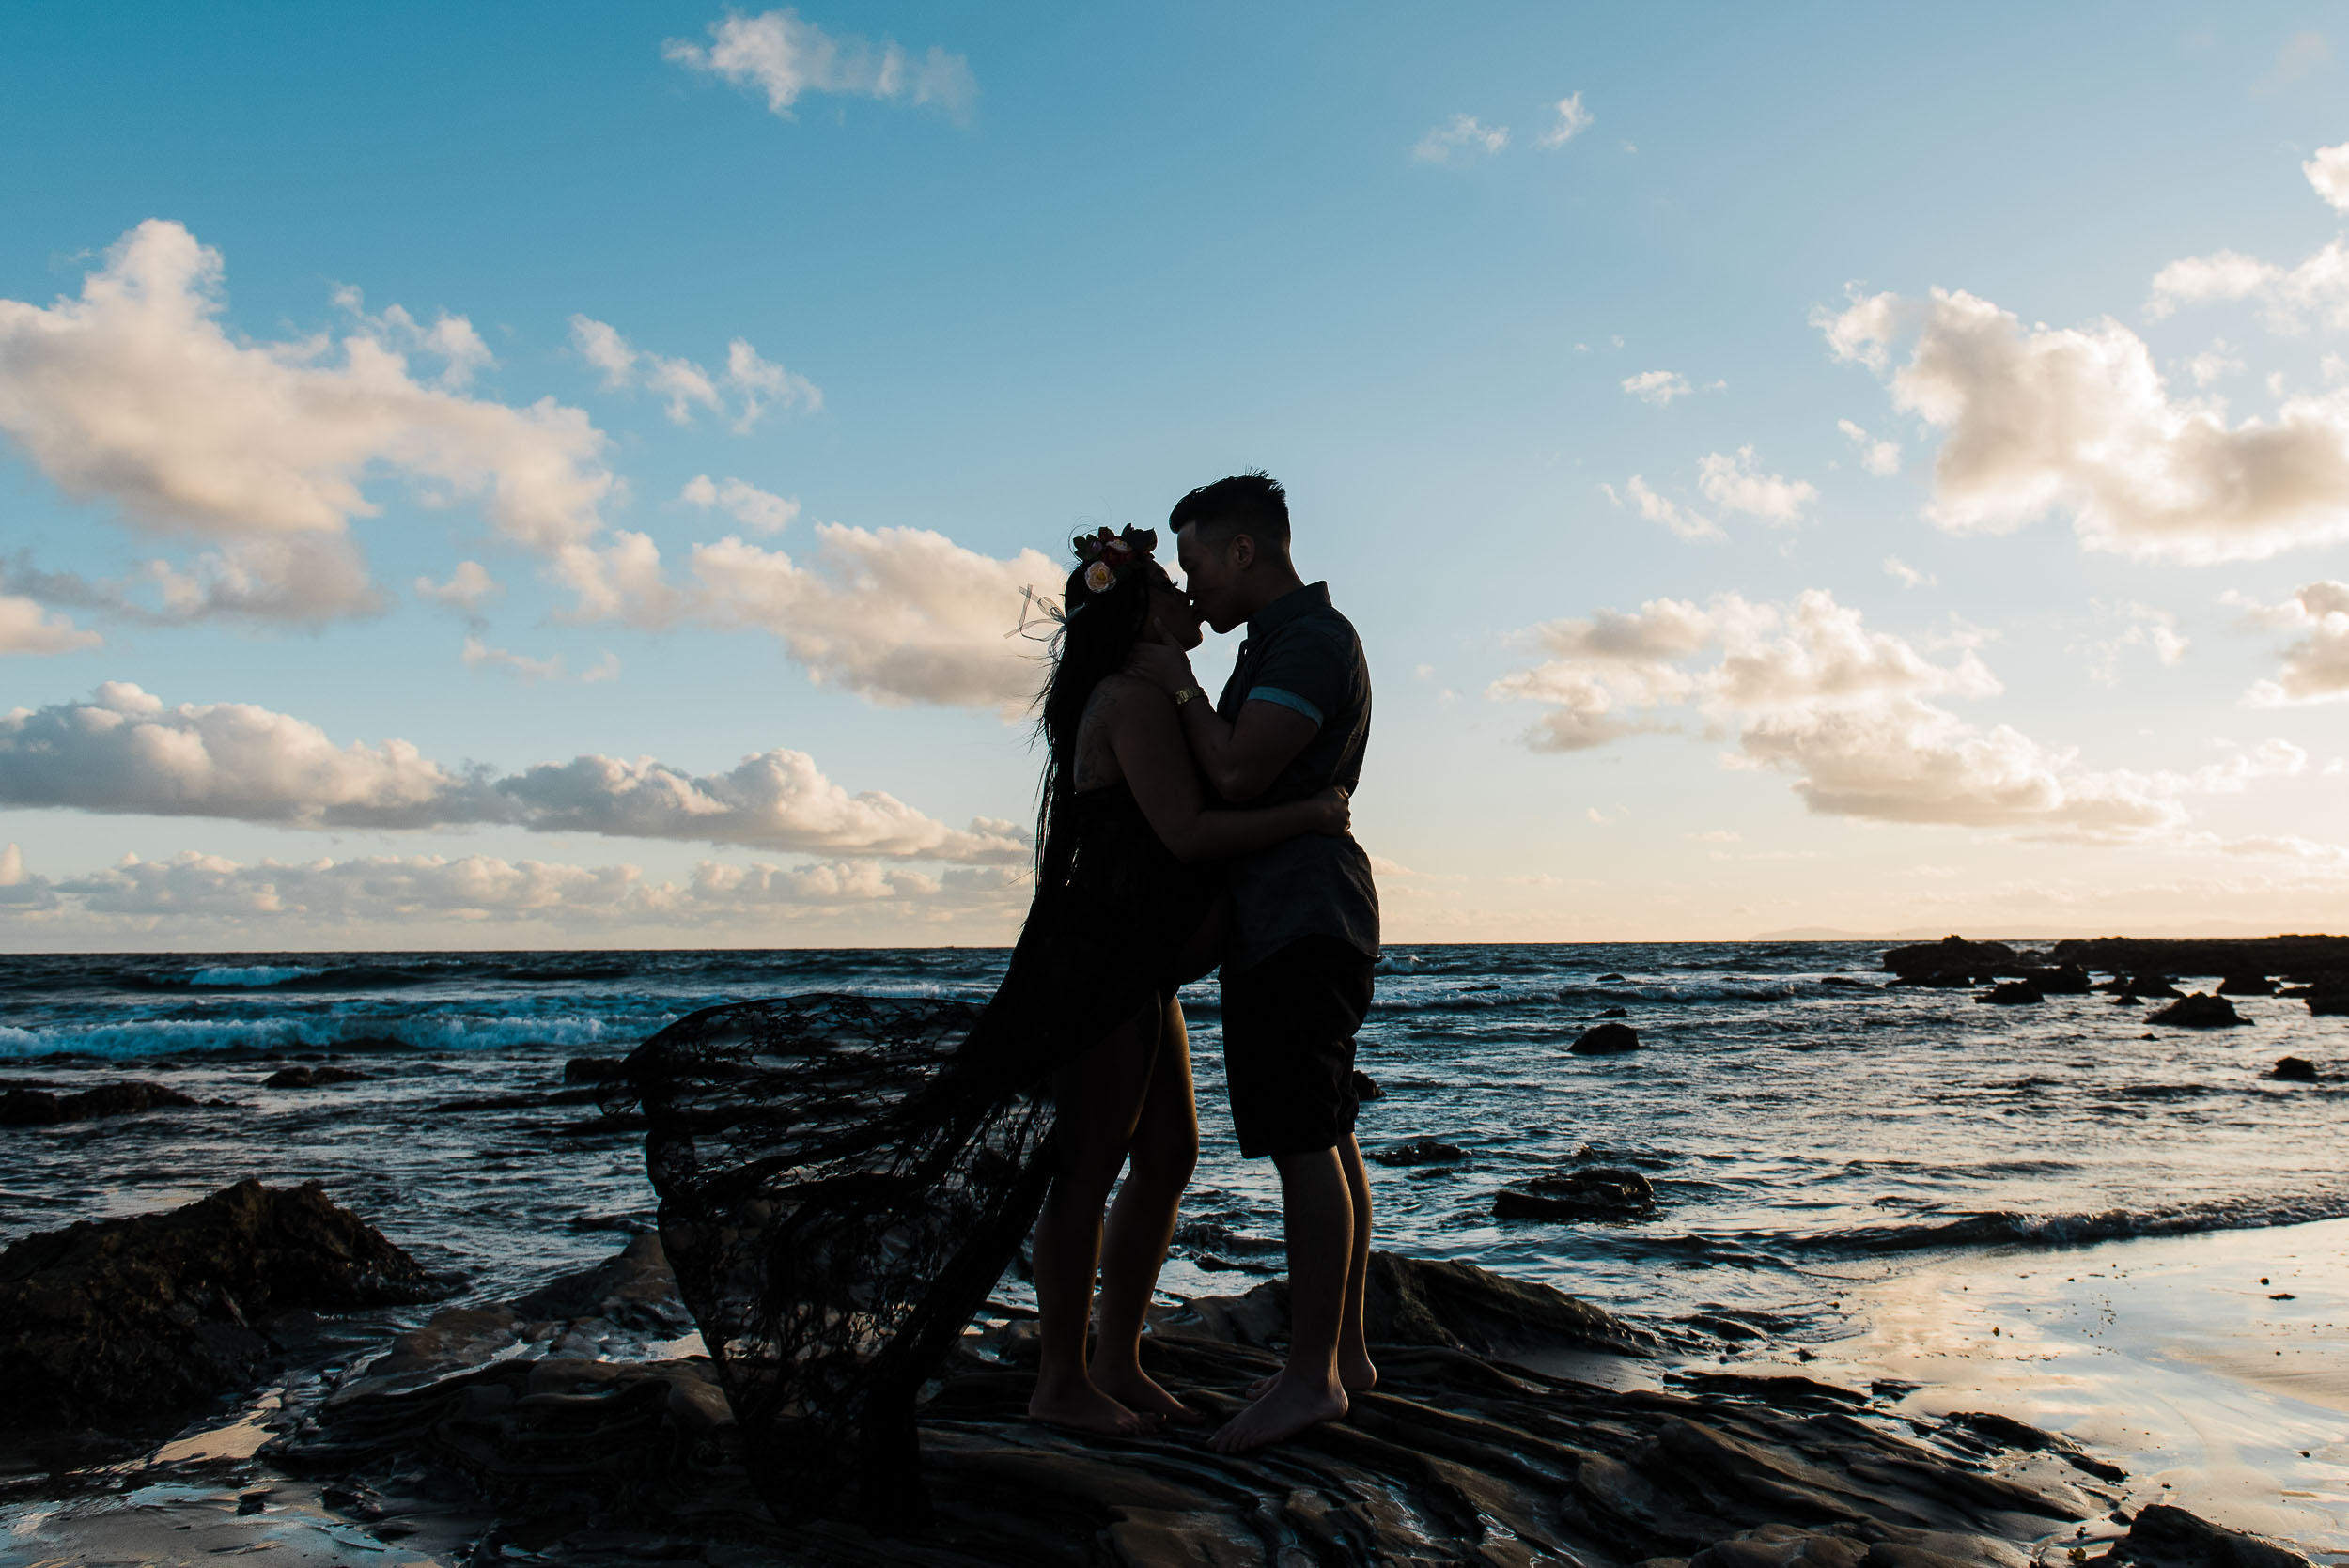 Miraflor-Photo-Peter-Crystal-Maternity-Photoshoot-Newport-Beach-20180317-060.jpg